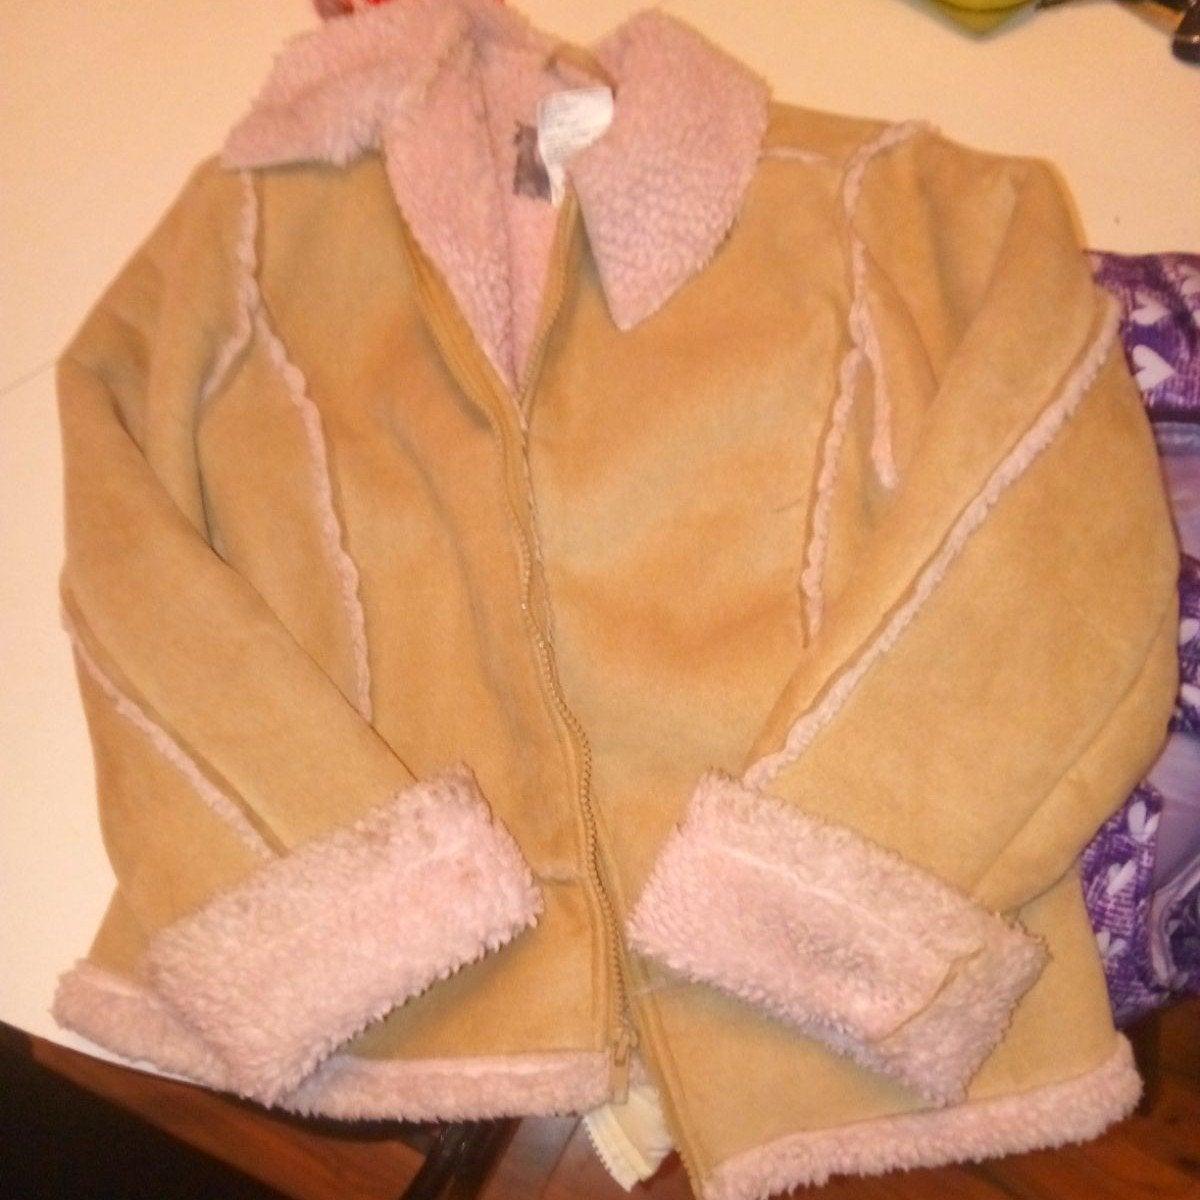 eced6a9d9 for for 4 amp; Rothschild Coats Girls Jackets Mercari WAtq8Ww6P1